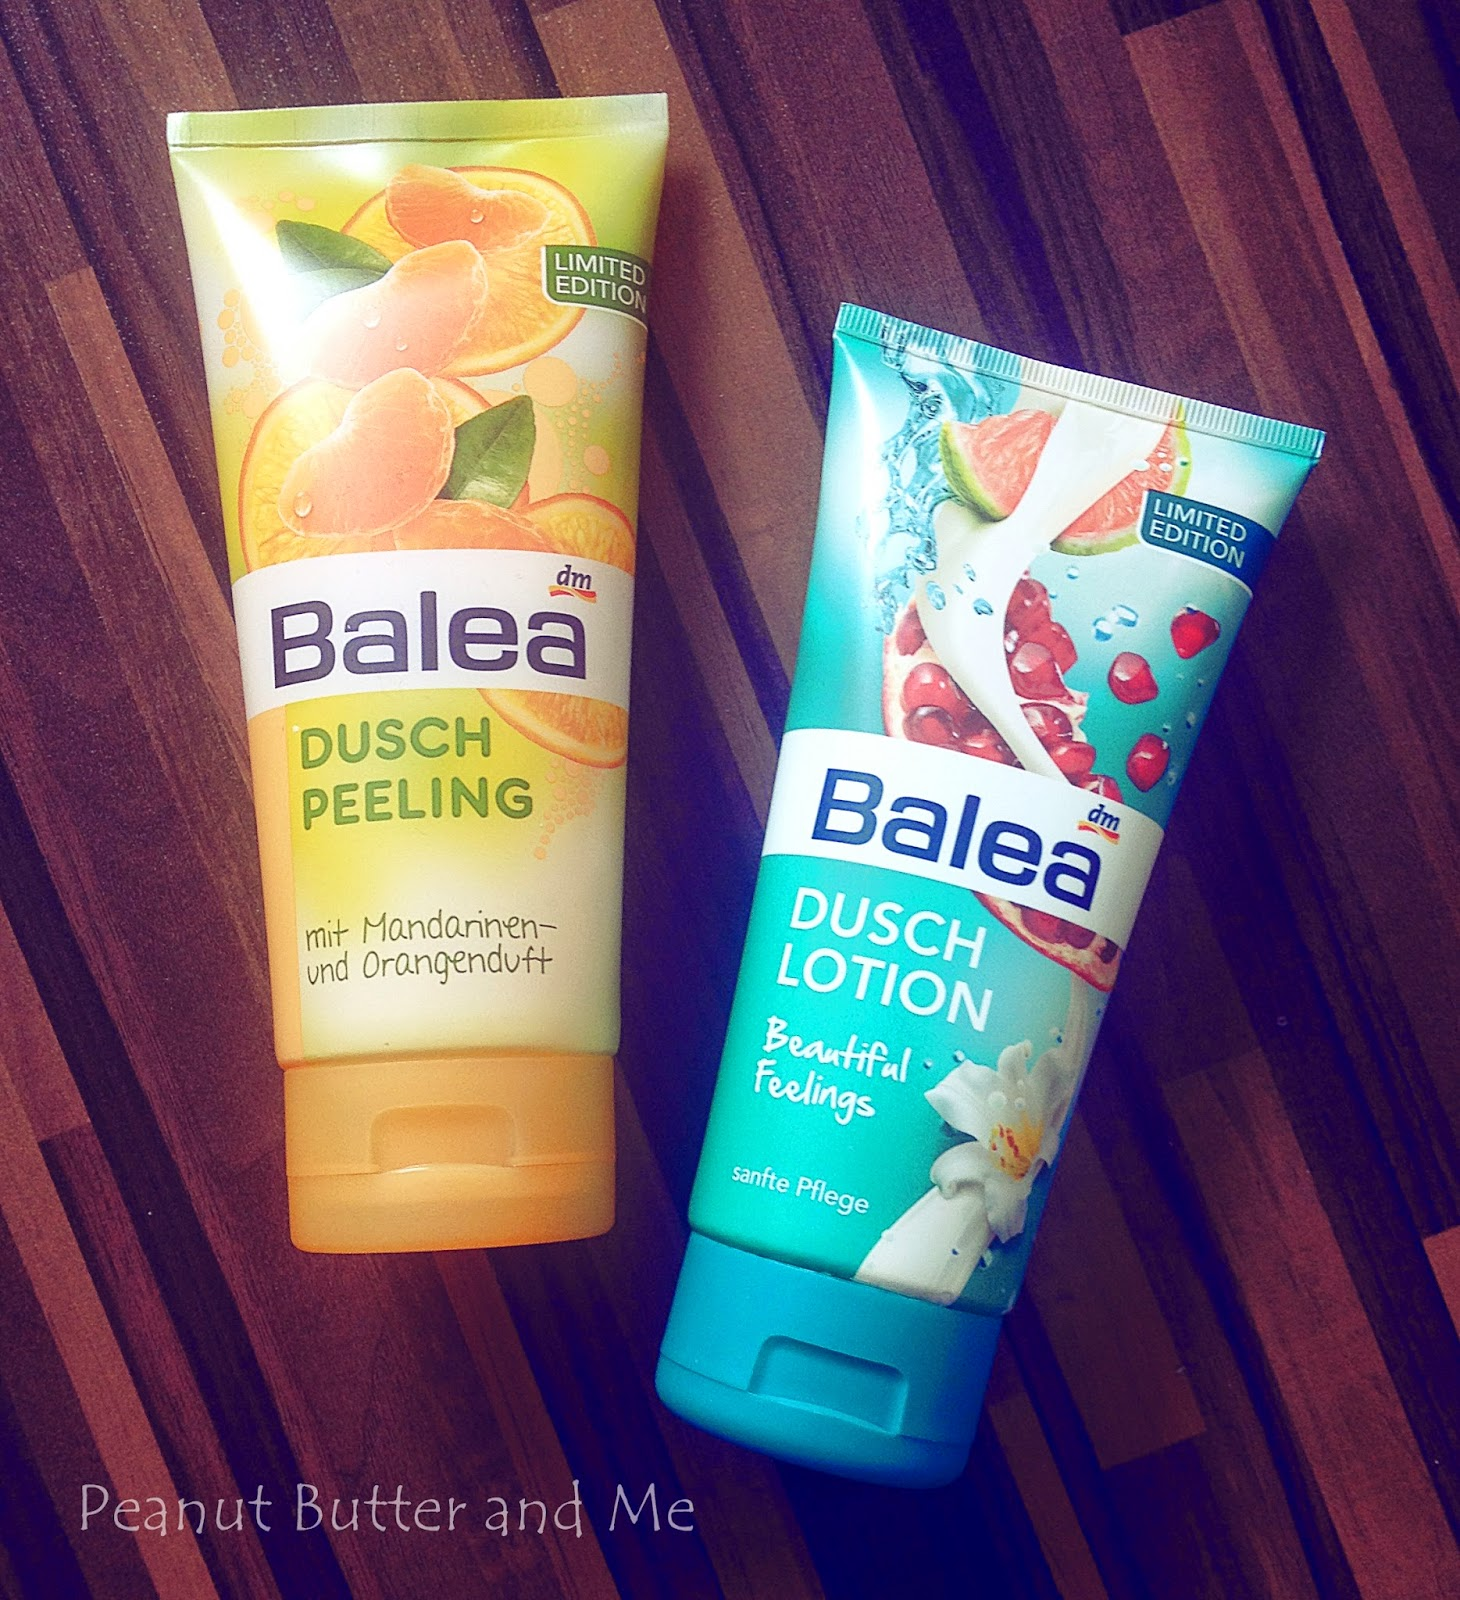 Balea dusch gel peeling balsam peeling dm zakupy limited limitowana edycja